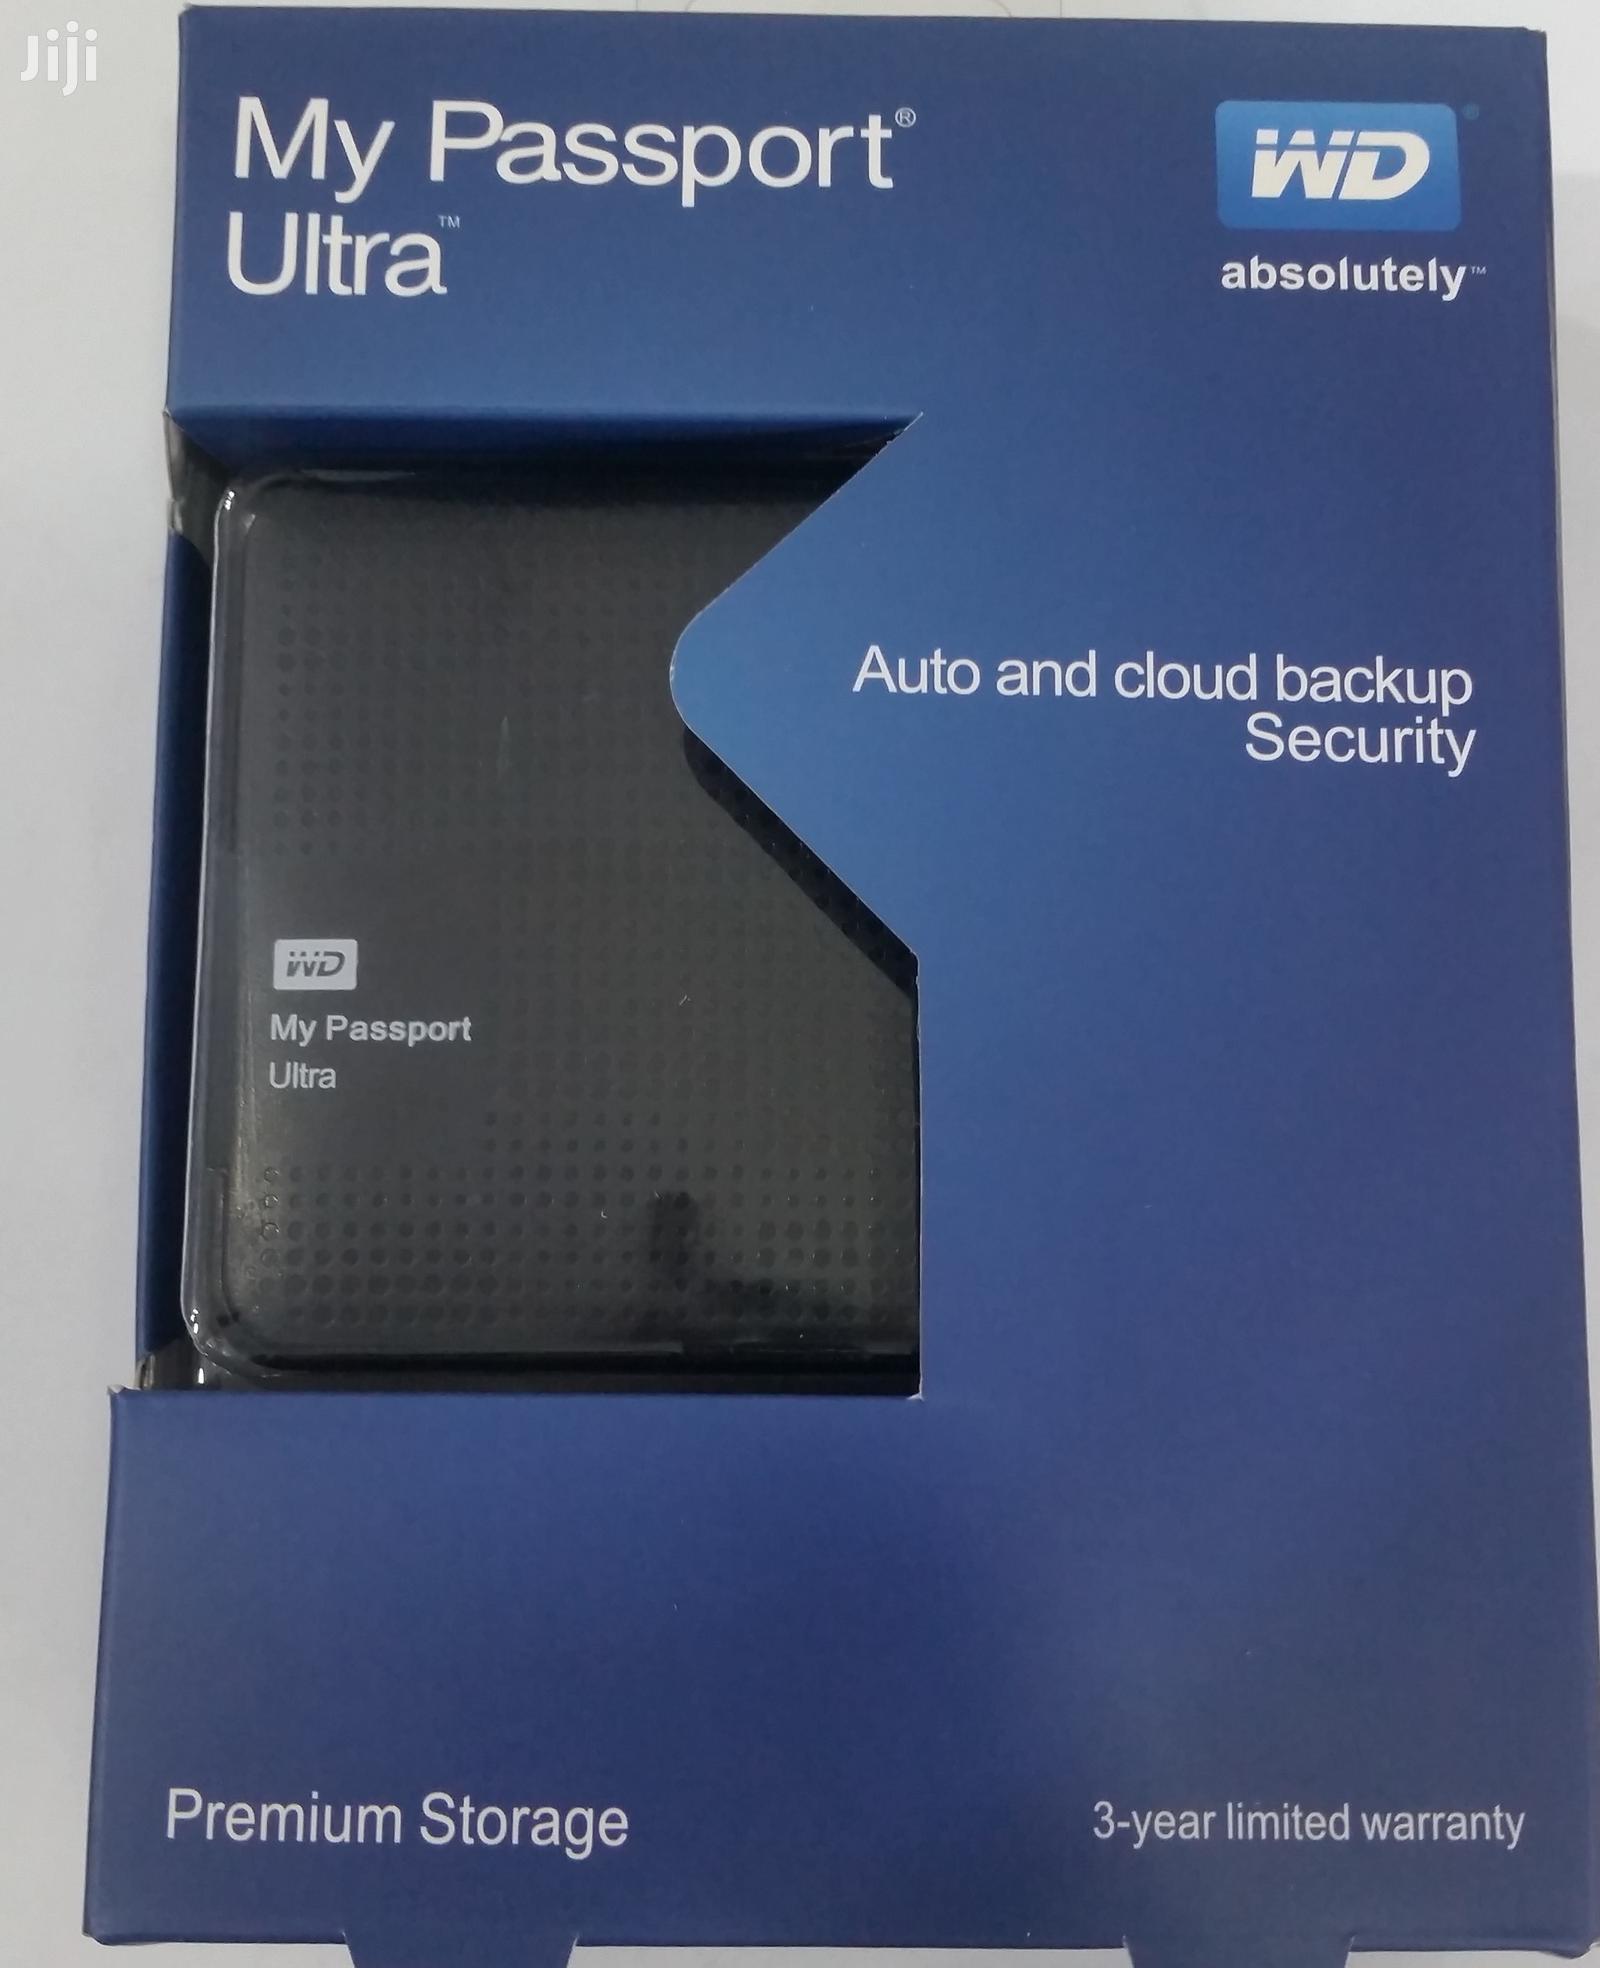 WD 3.0 My Passport Ultra External Hard Disk Case For Laptop